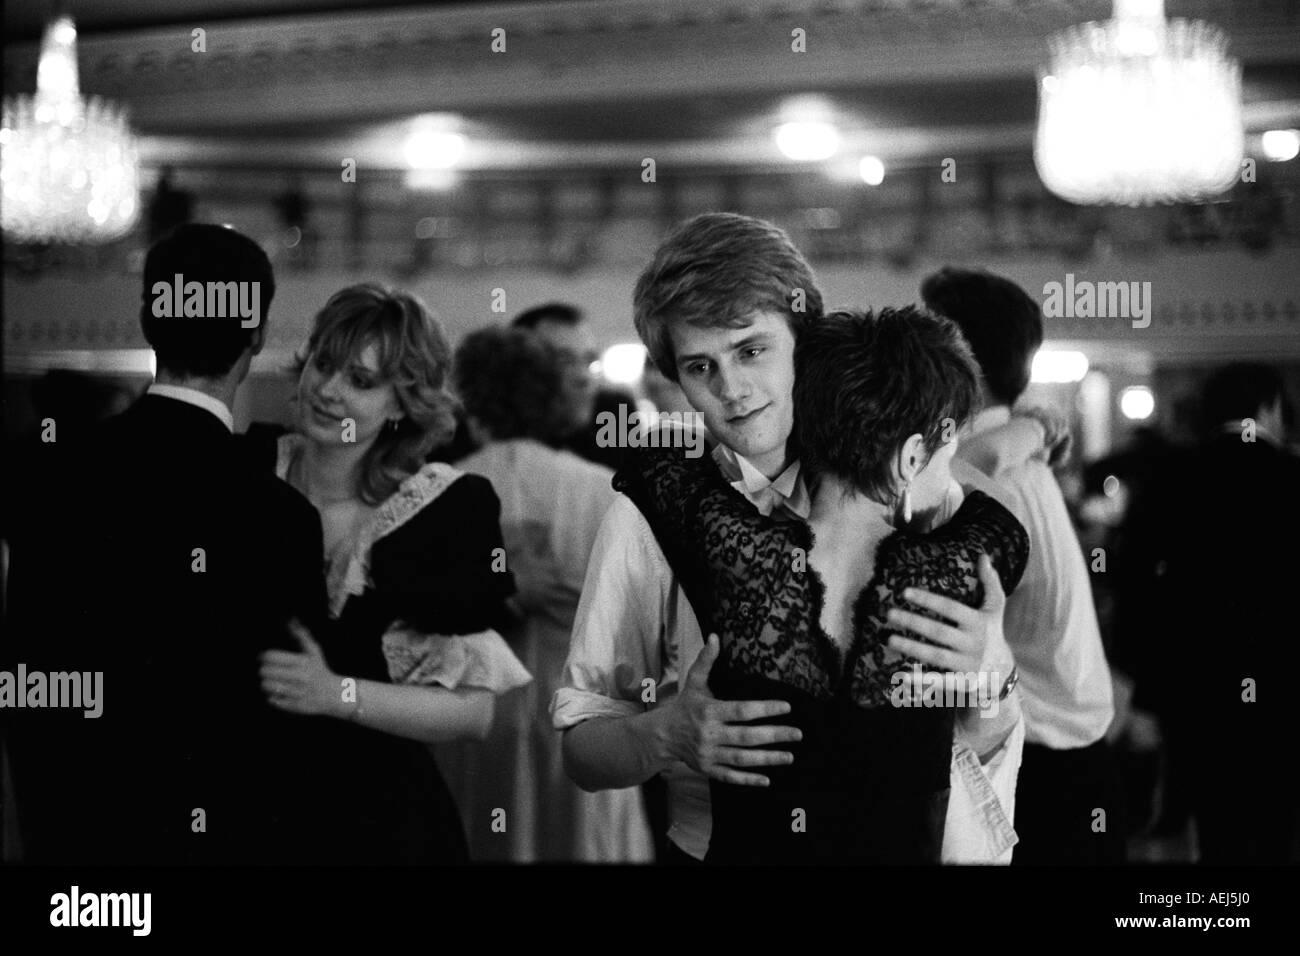 Sfera di Rose Grosvenor House Hotel, Park Lane, Londra Inghilterra 1982. HOMER SYKES Immagini Stock